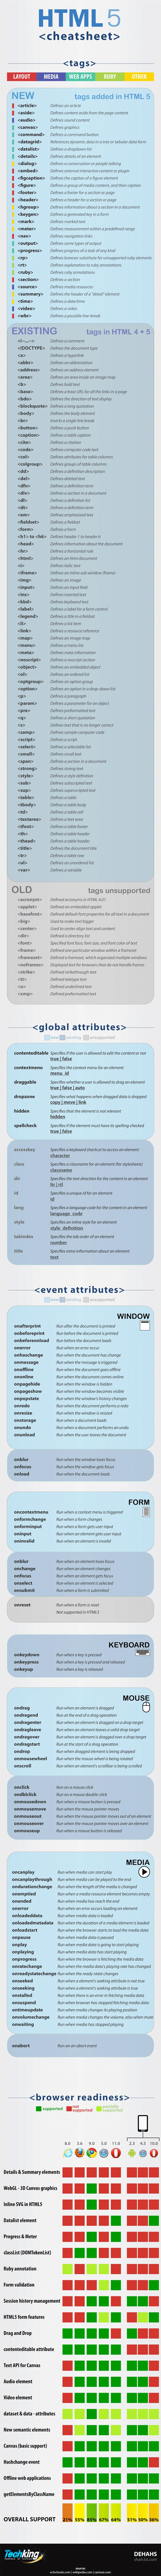 Etiquetas de HTML5, buena chuleta